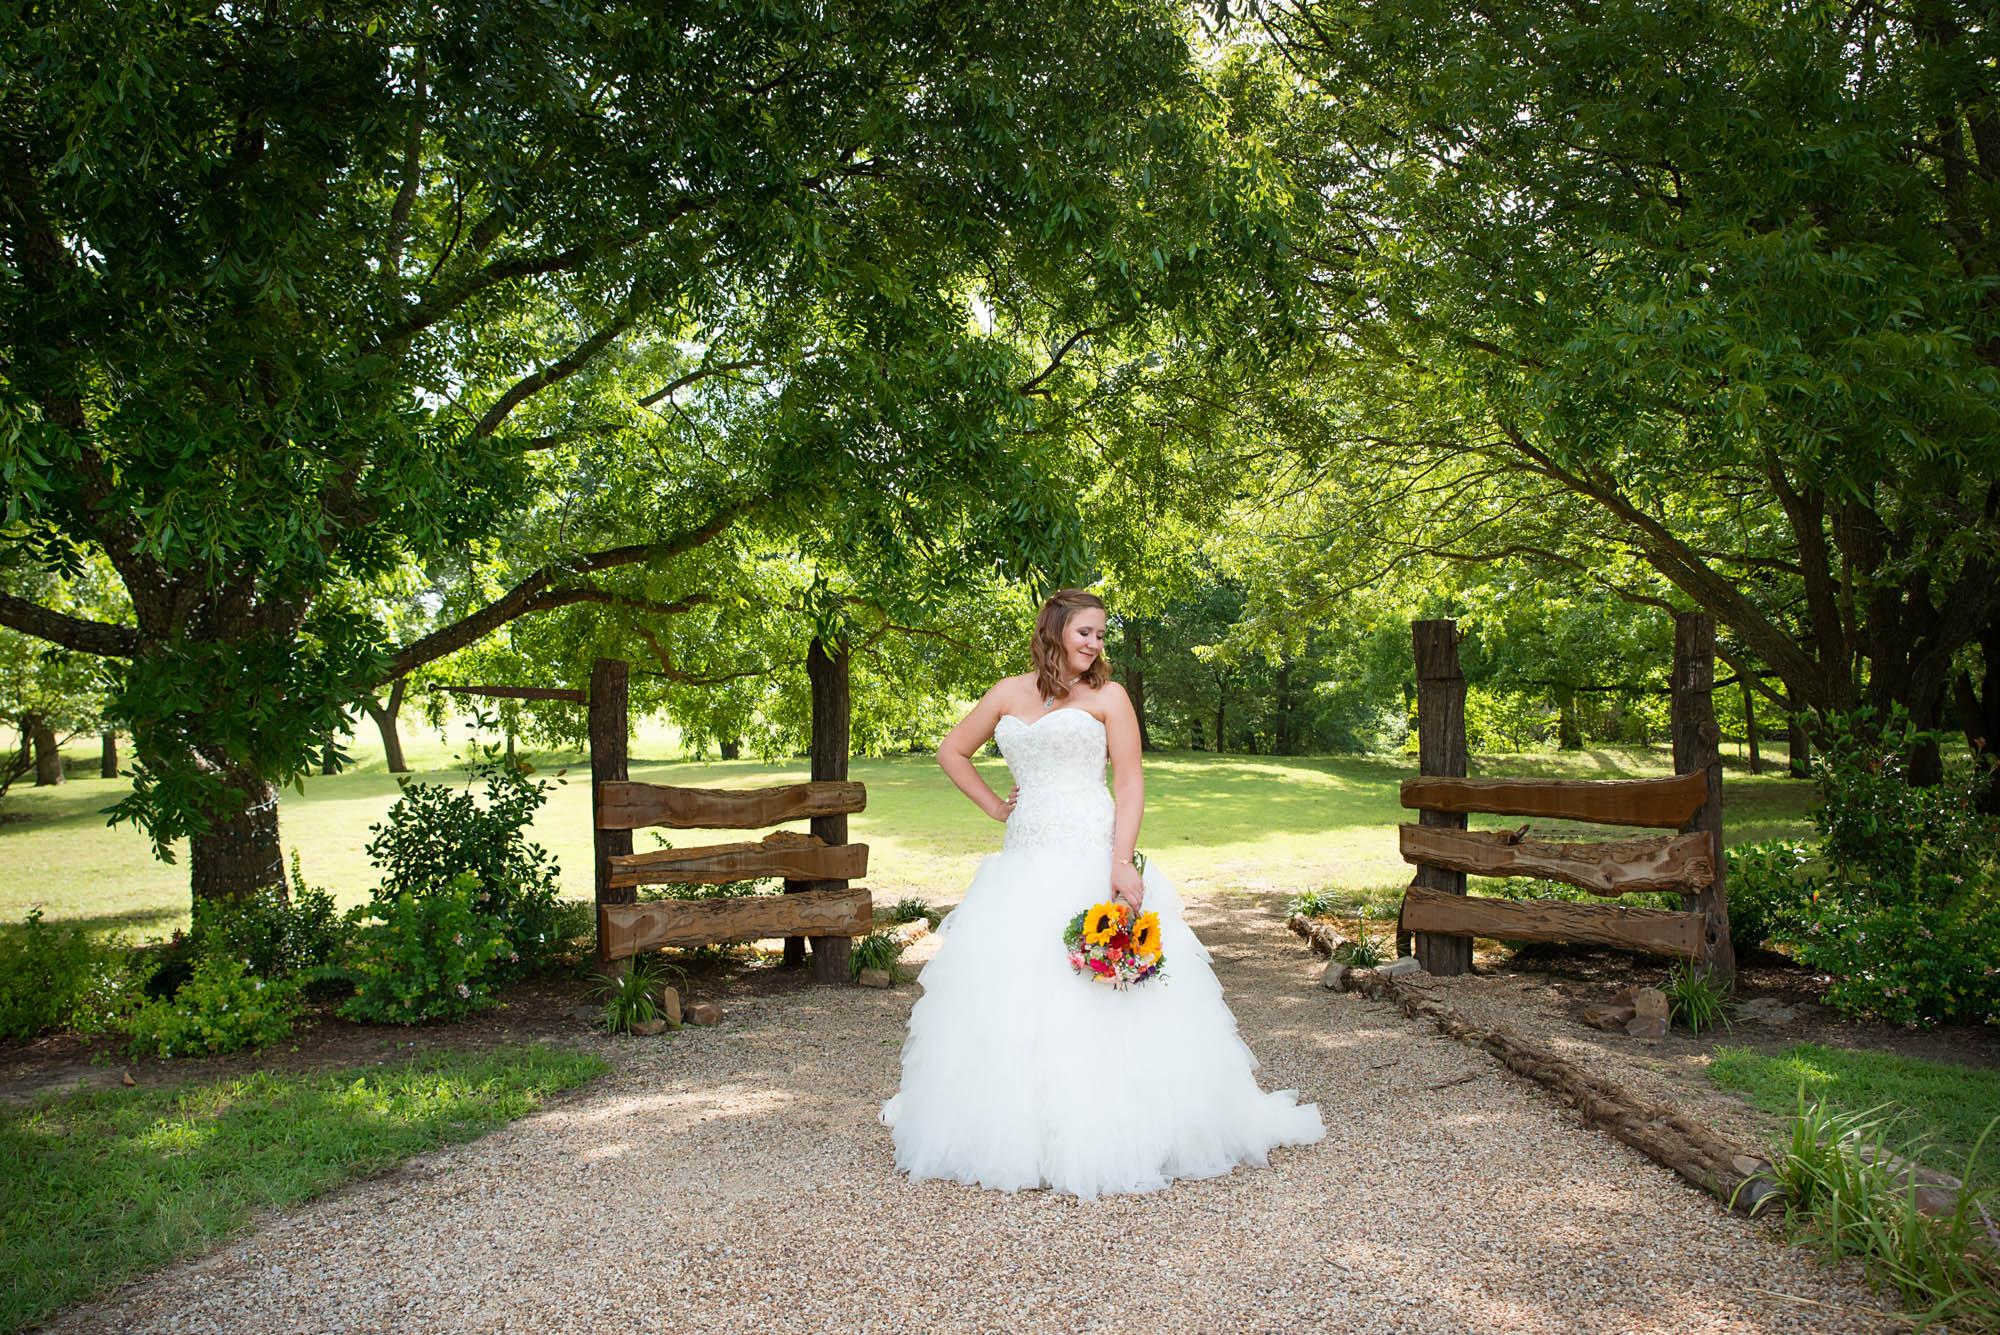 Stephanie Ray Wedding PhotographyDSC_3913w.jpg